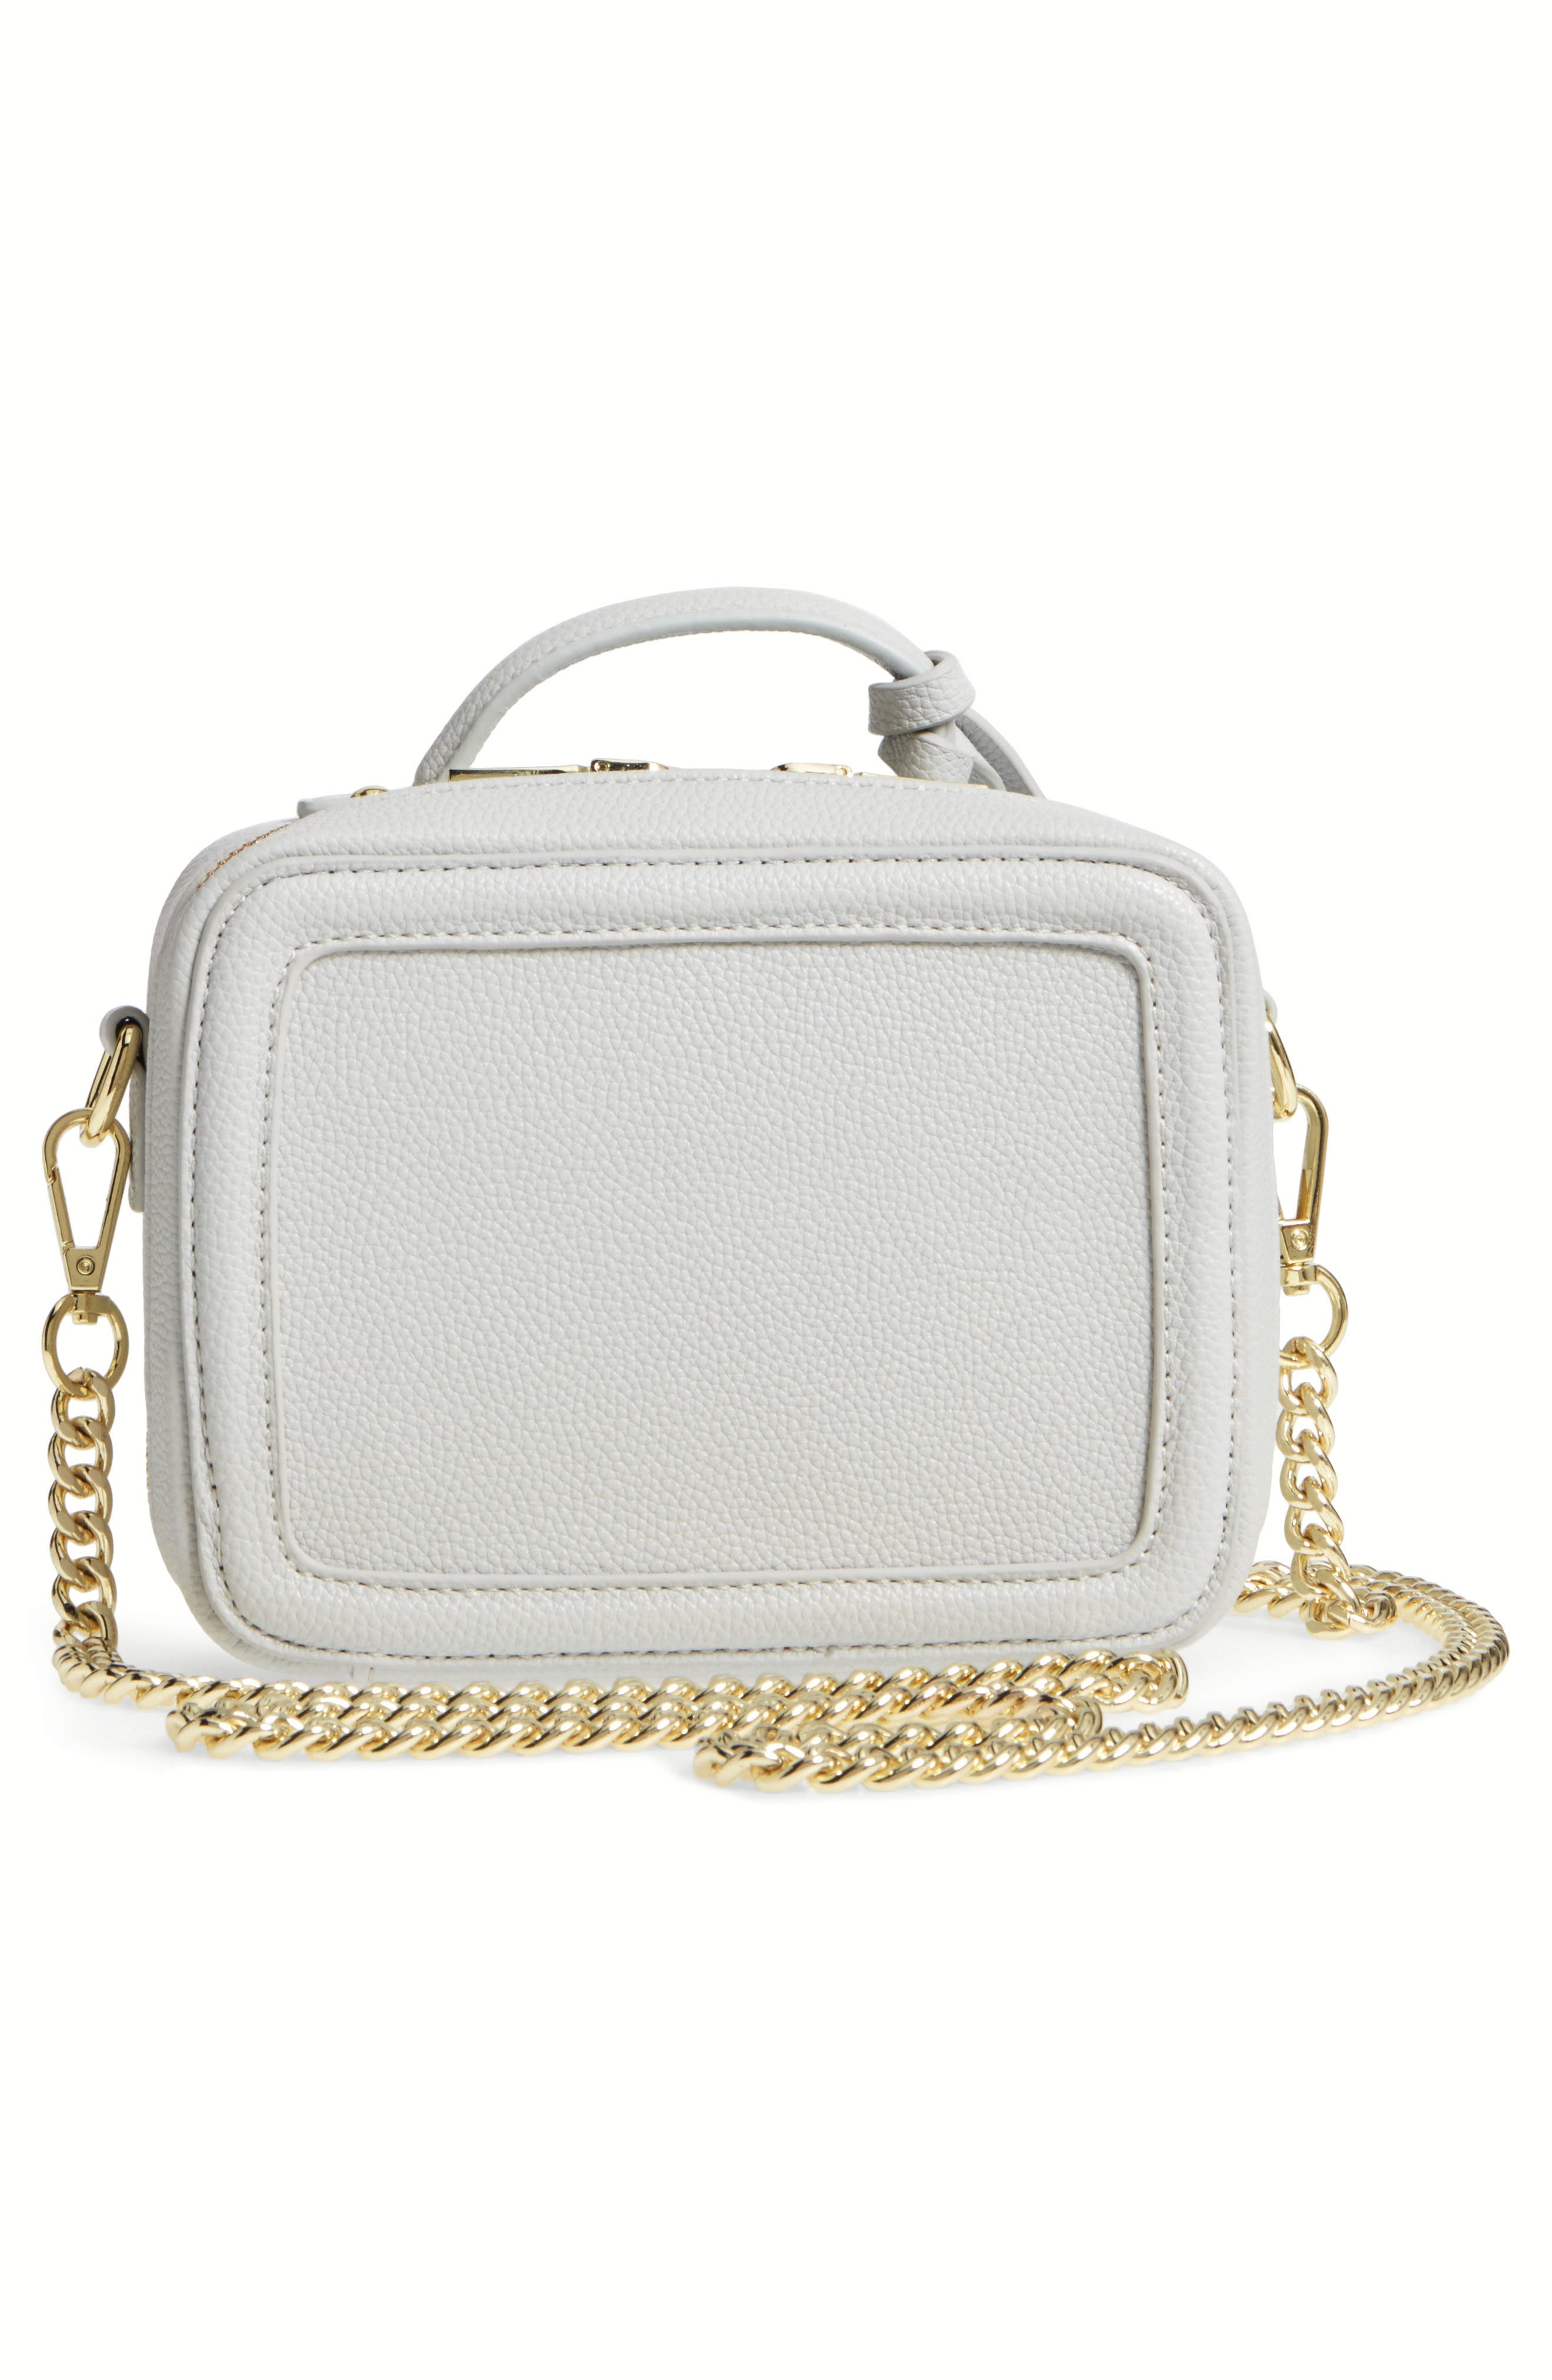 Taylor Faux Leather Crossbody Bag,                             Alternate thumbnail 3, color,